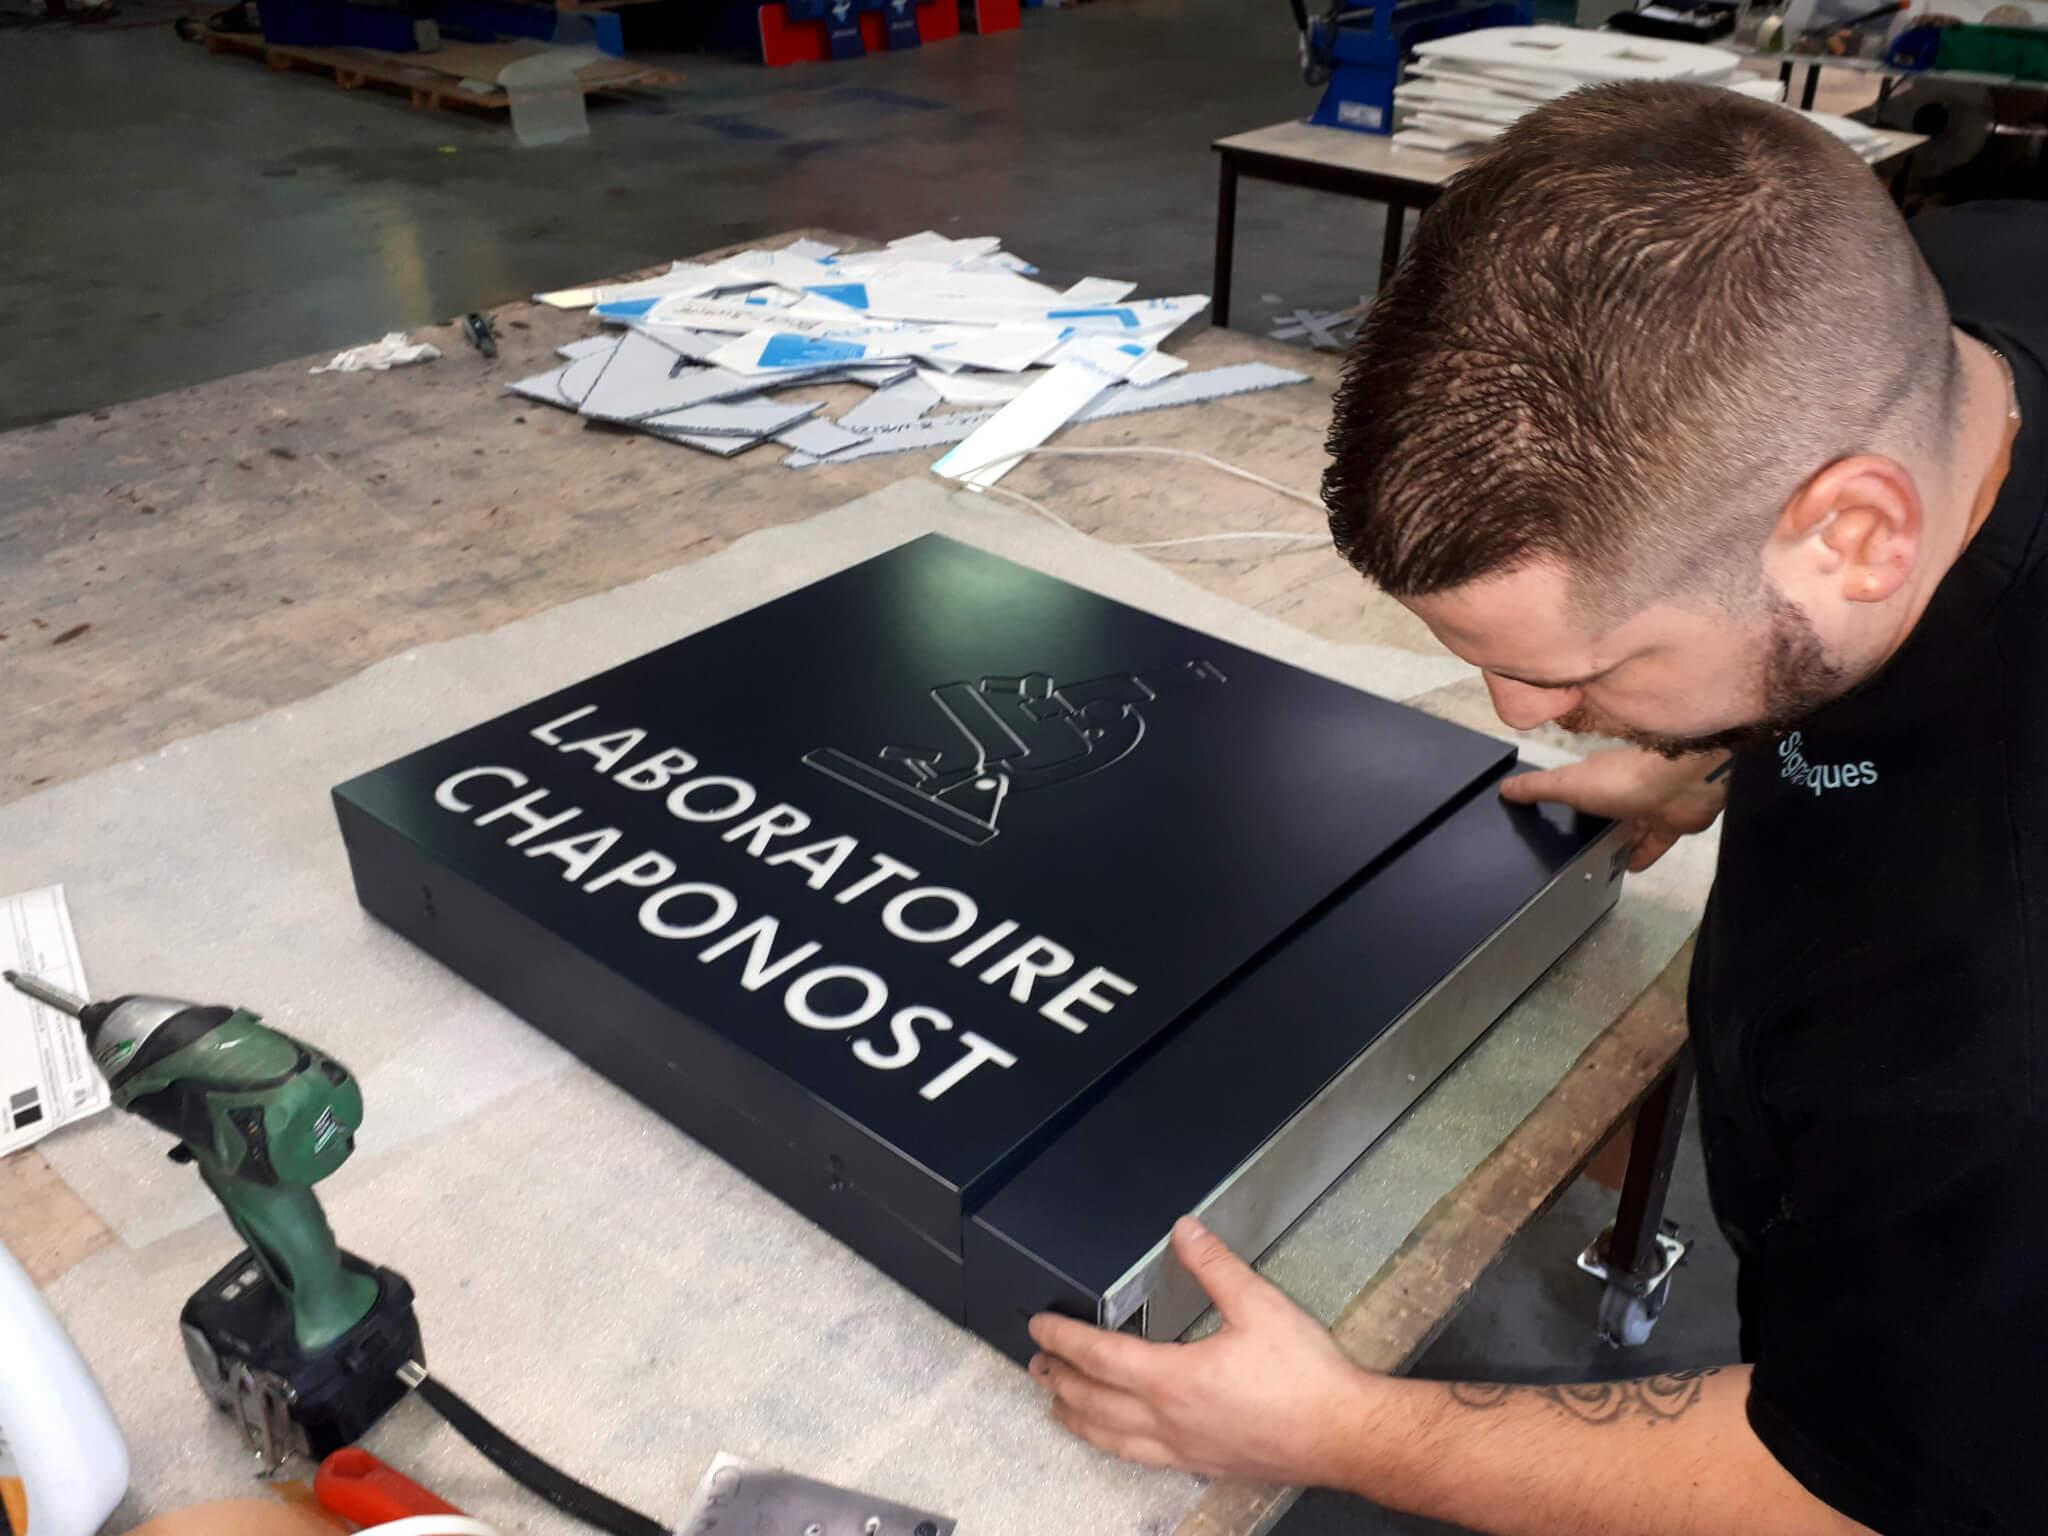 Fabrication Enseignes lumineuses Lyon - Face ajourée enseigne - SES Grigny- Rhône